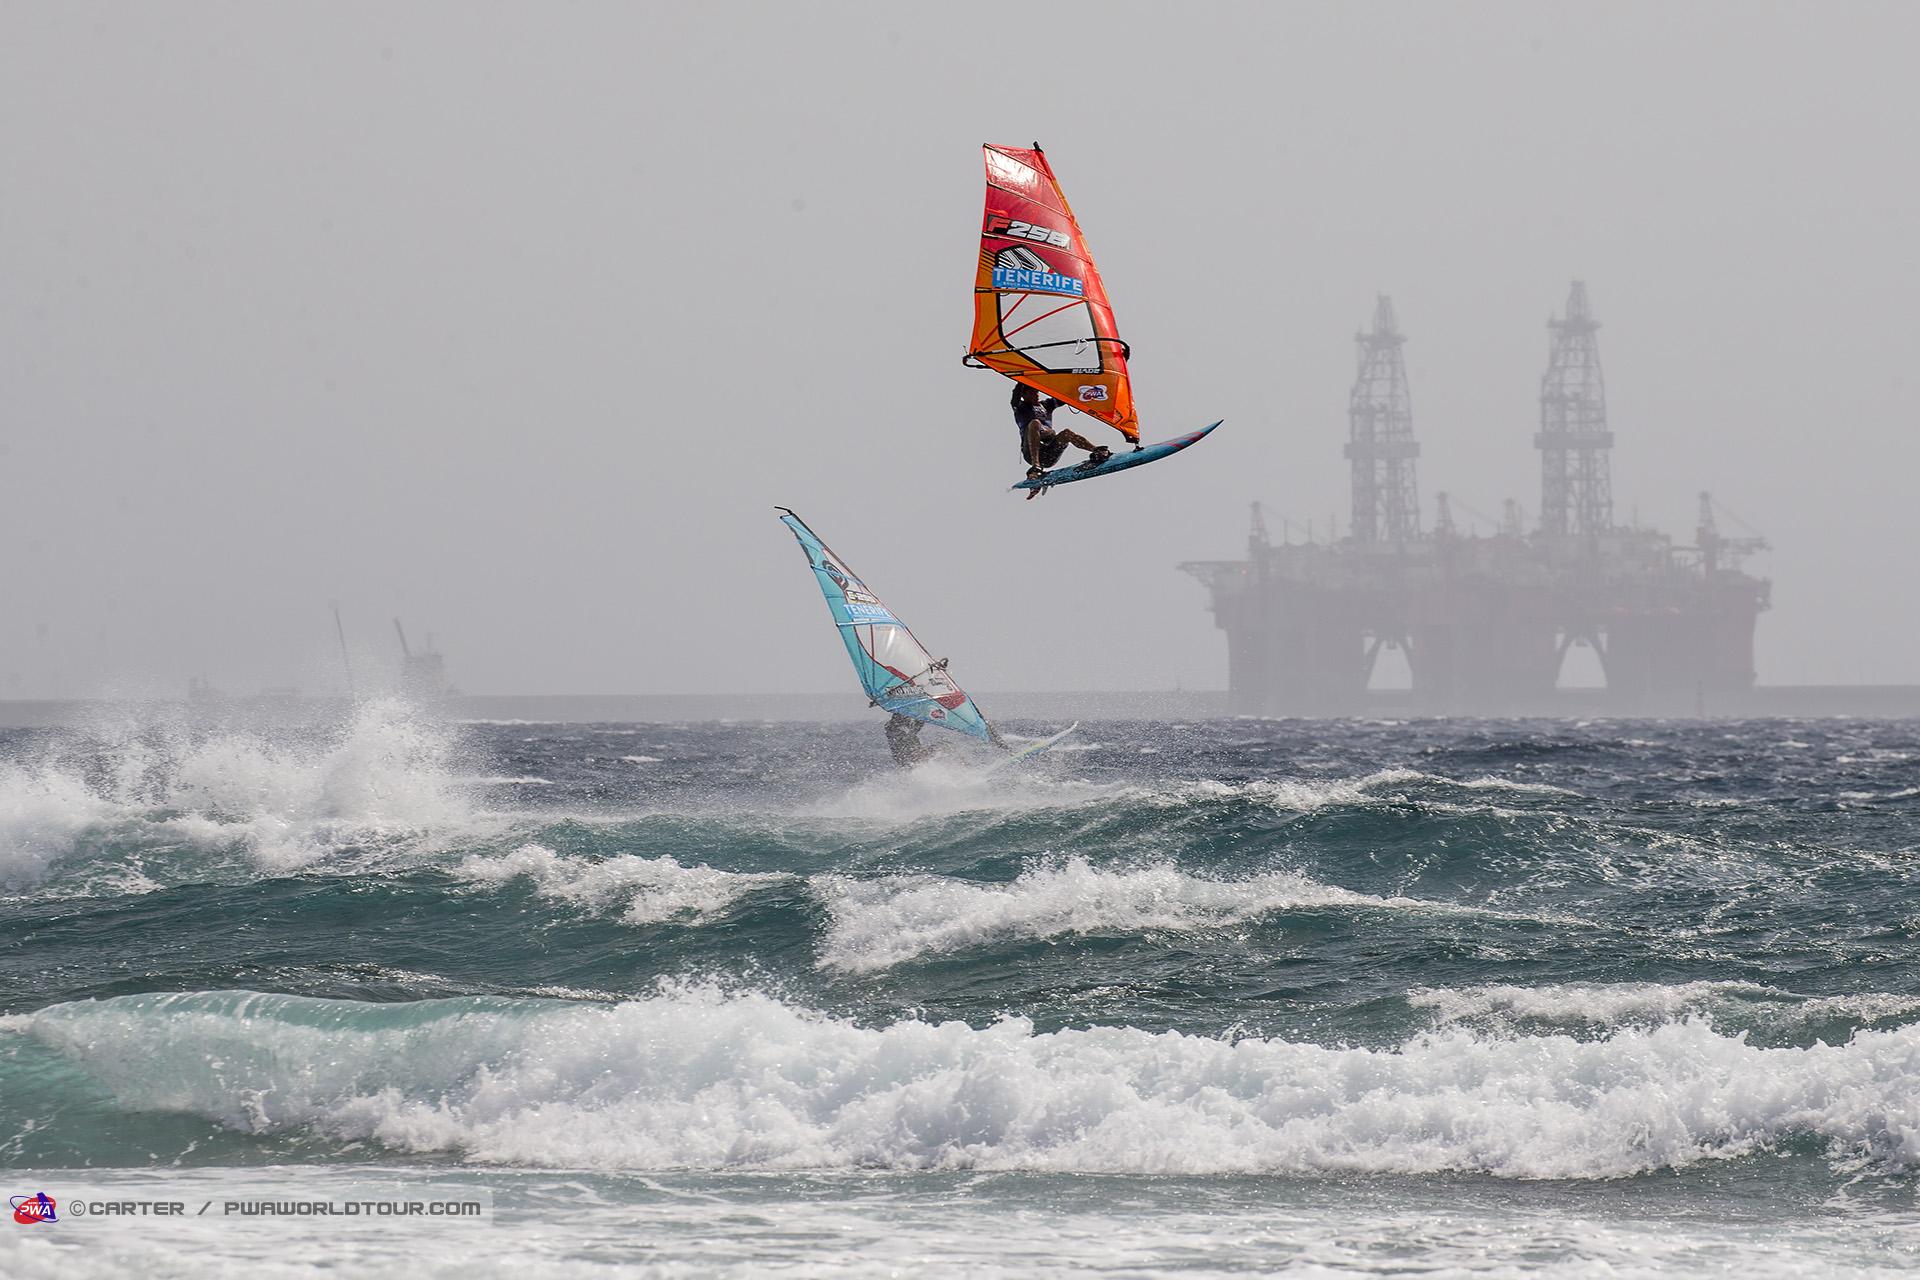 TF18_wv_Cloarec_flying_high.jpg